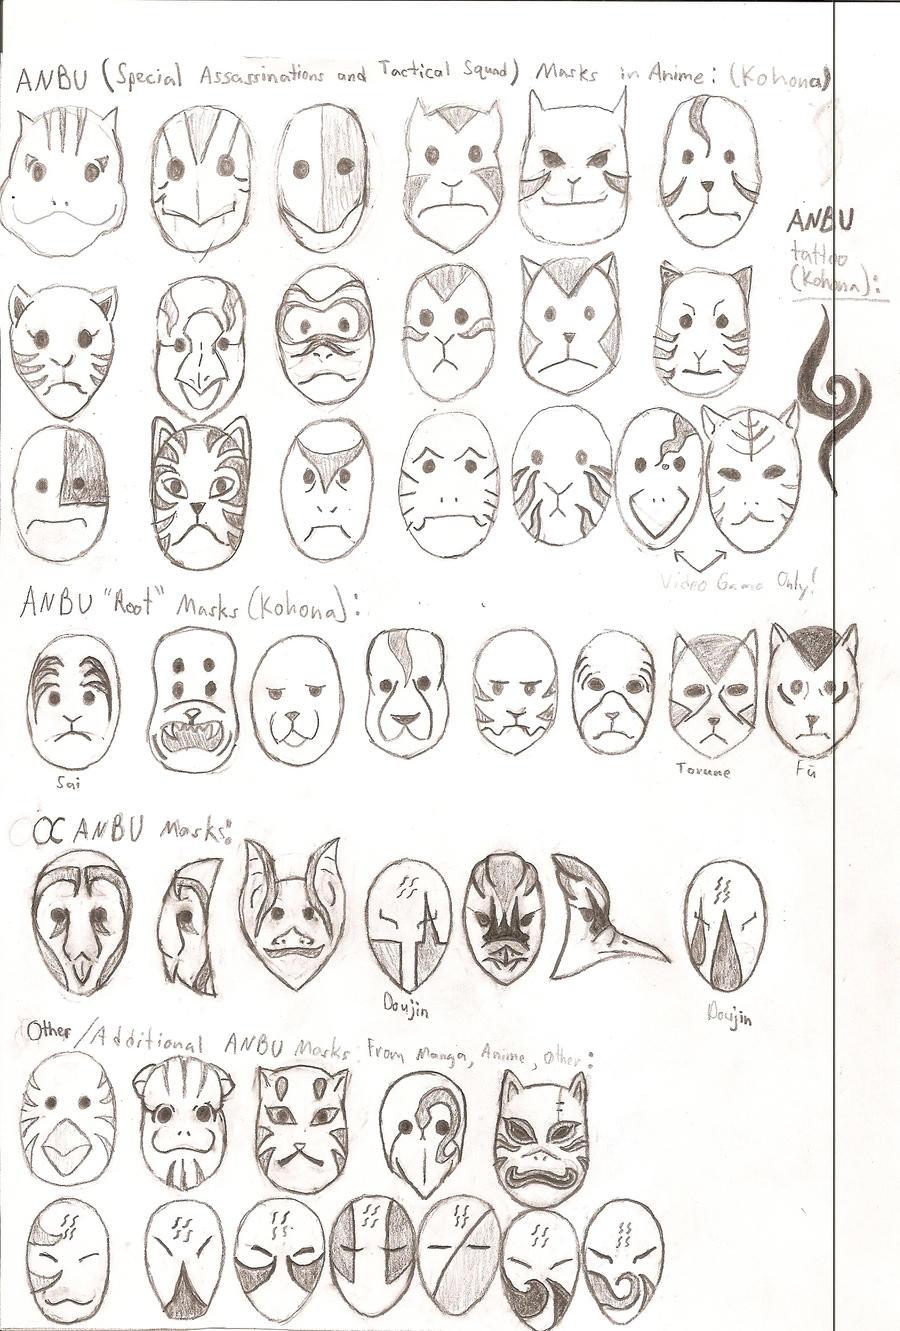 Anbu Mask Designs Anbu mask 2 0  additonalHow To Make A Anbu Mask